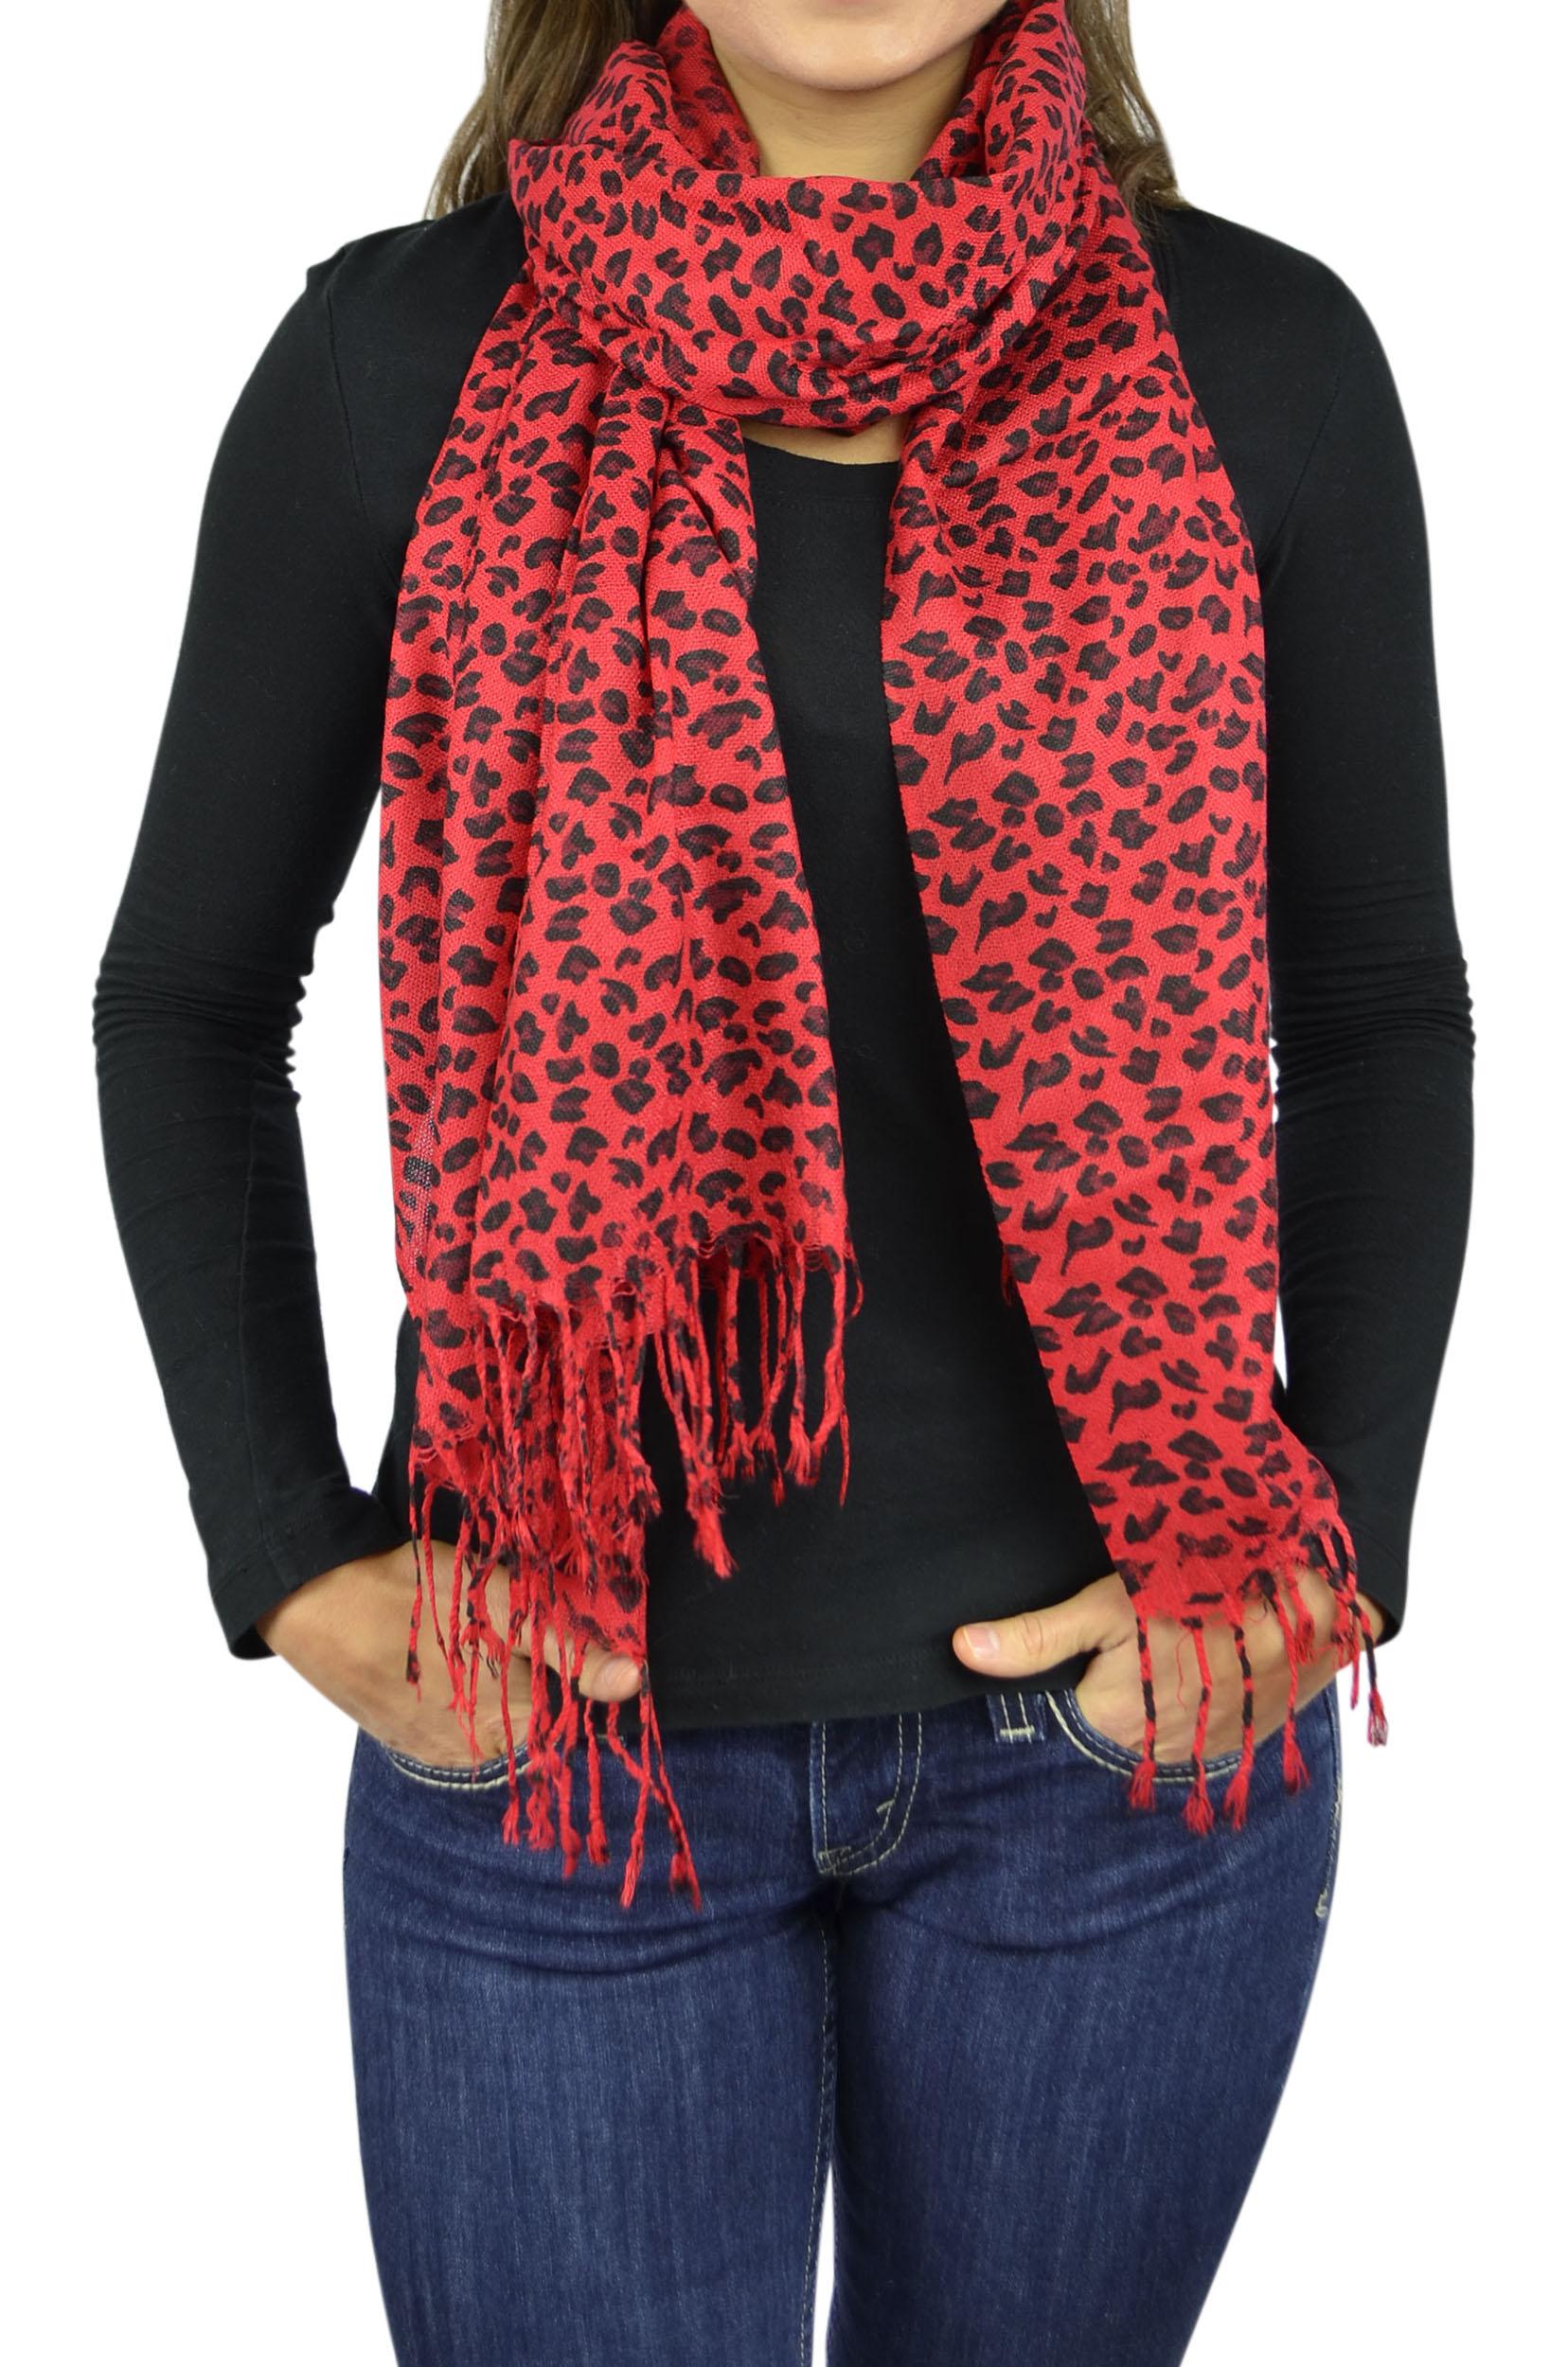 ca41eef604894 Pashmina Scarf Women Scarfs Soft Wrap Shawl Animal Print: Zebra Leopard  Giraffe Scarves By Belle